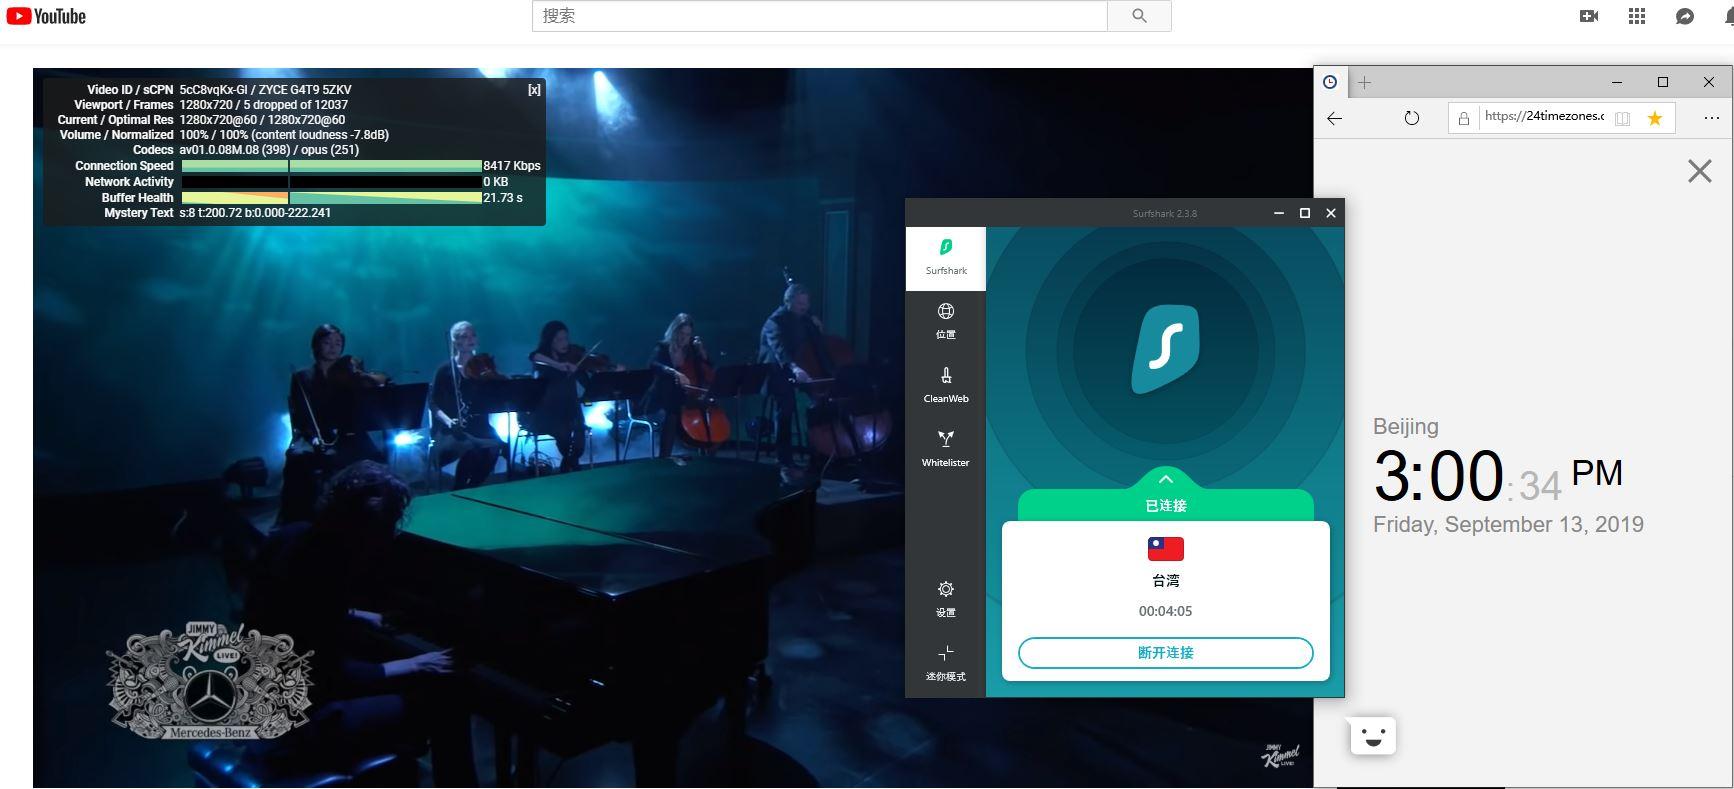 windows Surfshark VPN 台湾服务器 中国VPN翻墙软件 科学上网 YouTube速度测试-20190913